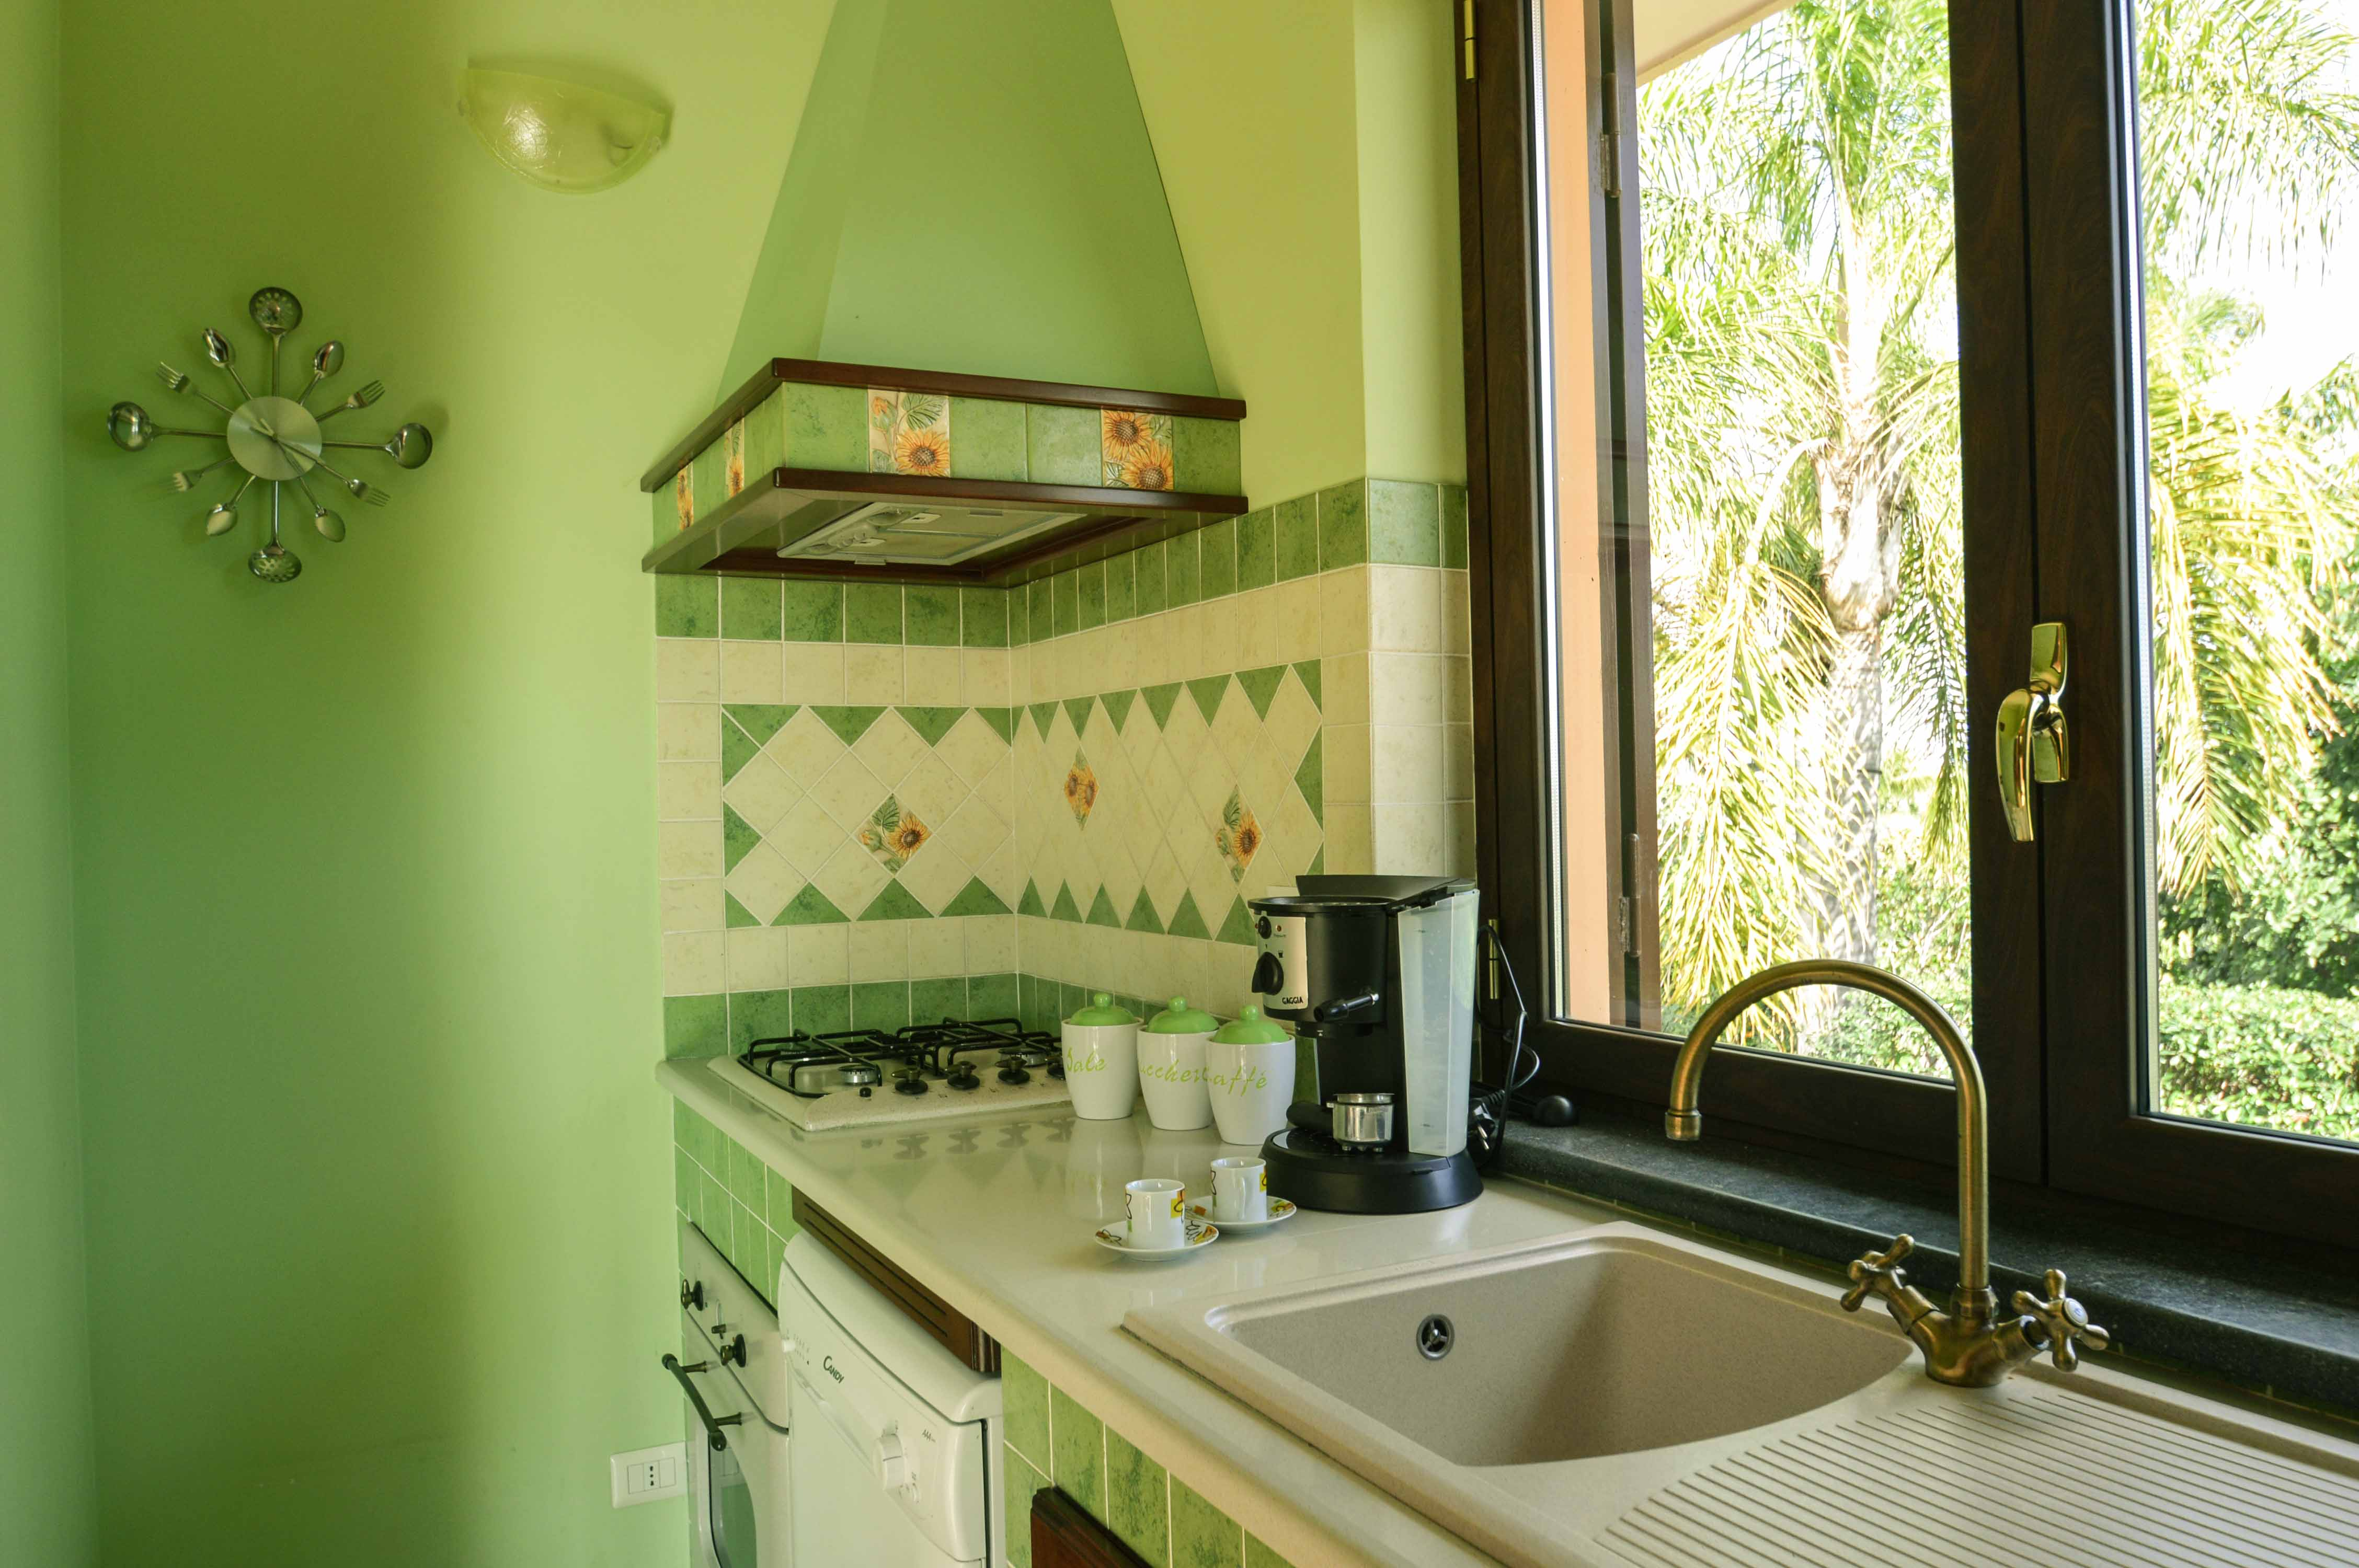 Ferienhaus Villa Giada- enjoys views of Mount Etna and the sea, a true paradise (2383441), Acireale, Catania, Sizilien, Italien, Bild 11